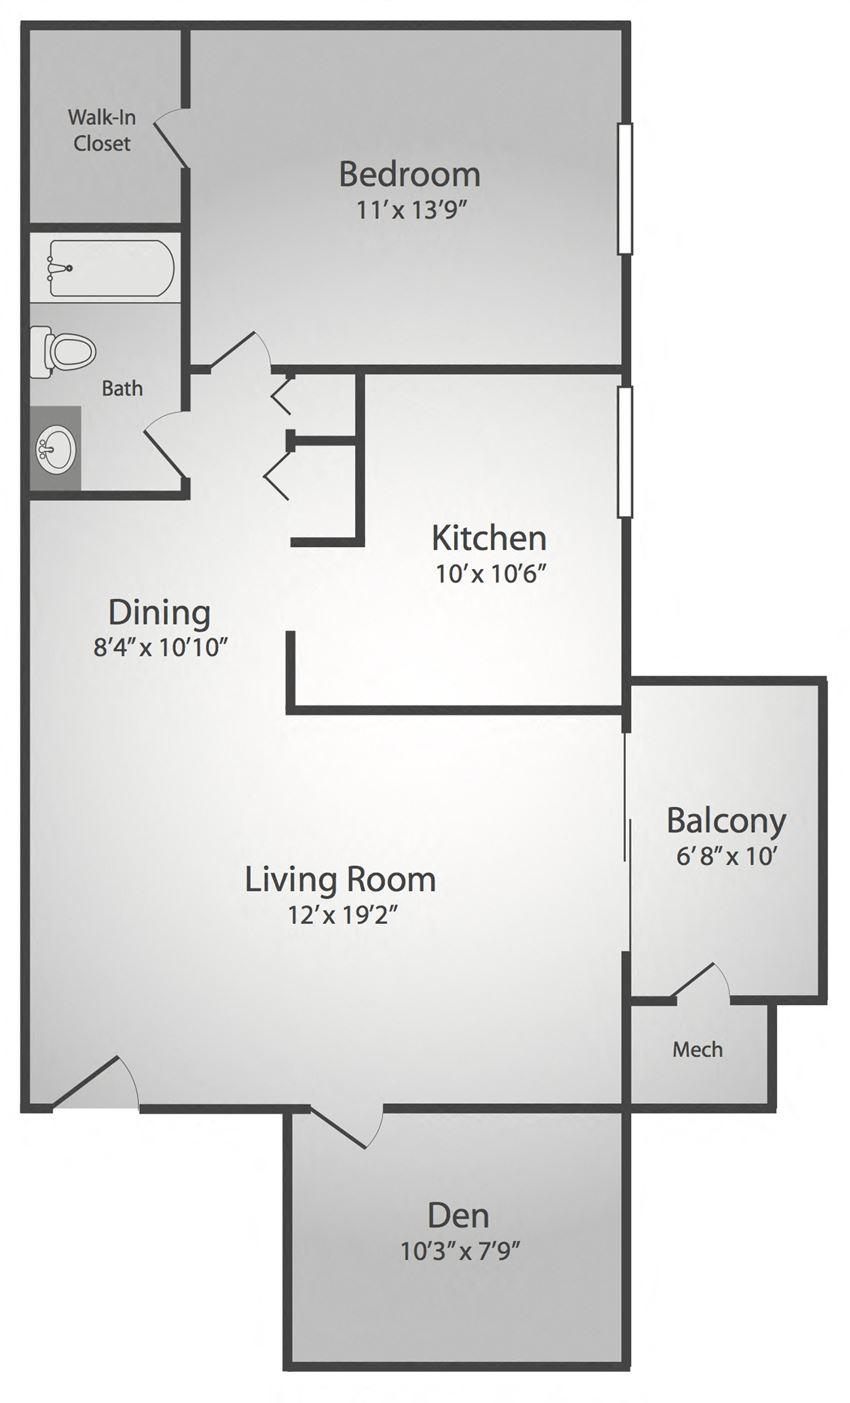 1 Bedroom, 1 Bath, Den